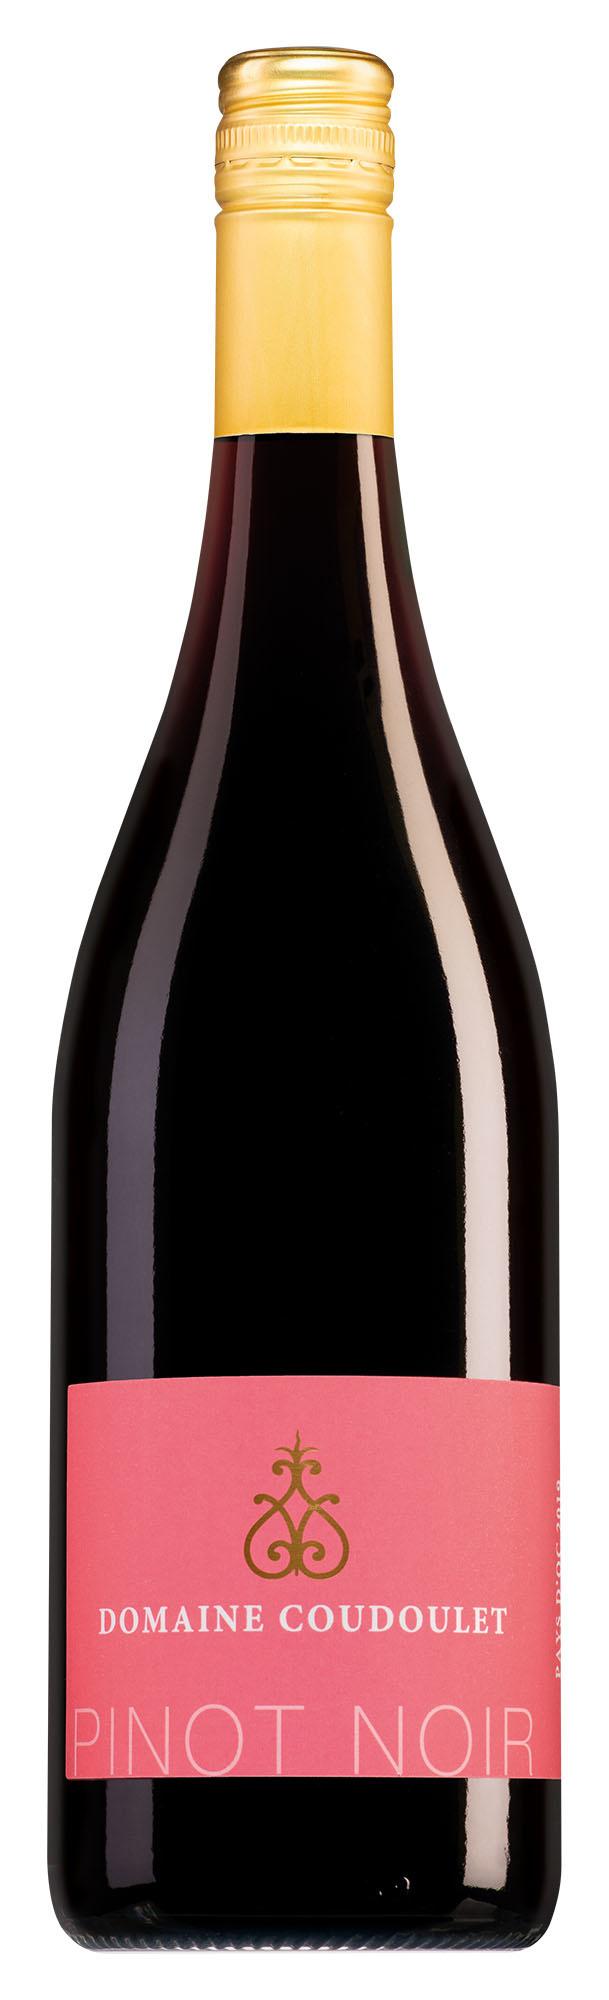 Coudoulet Pinot Noir 2020